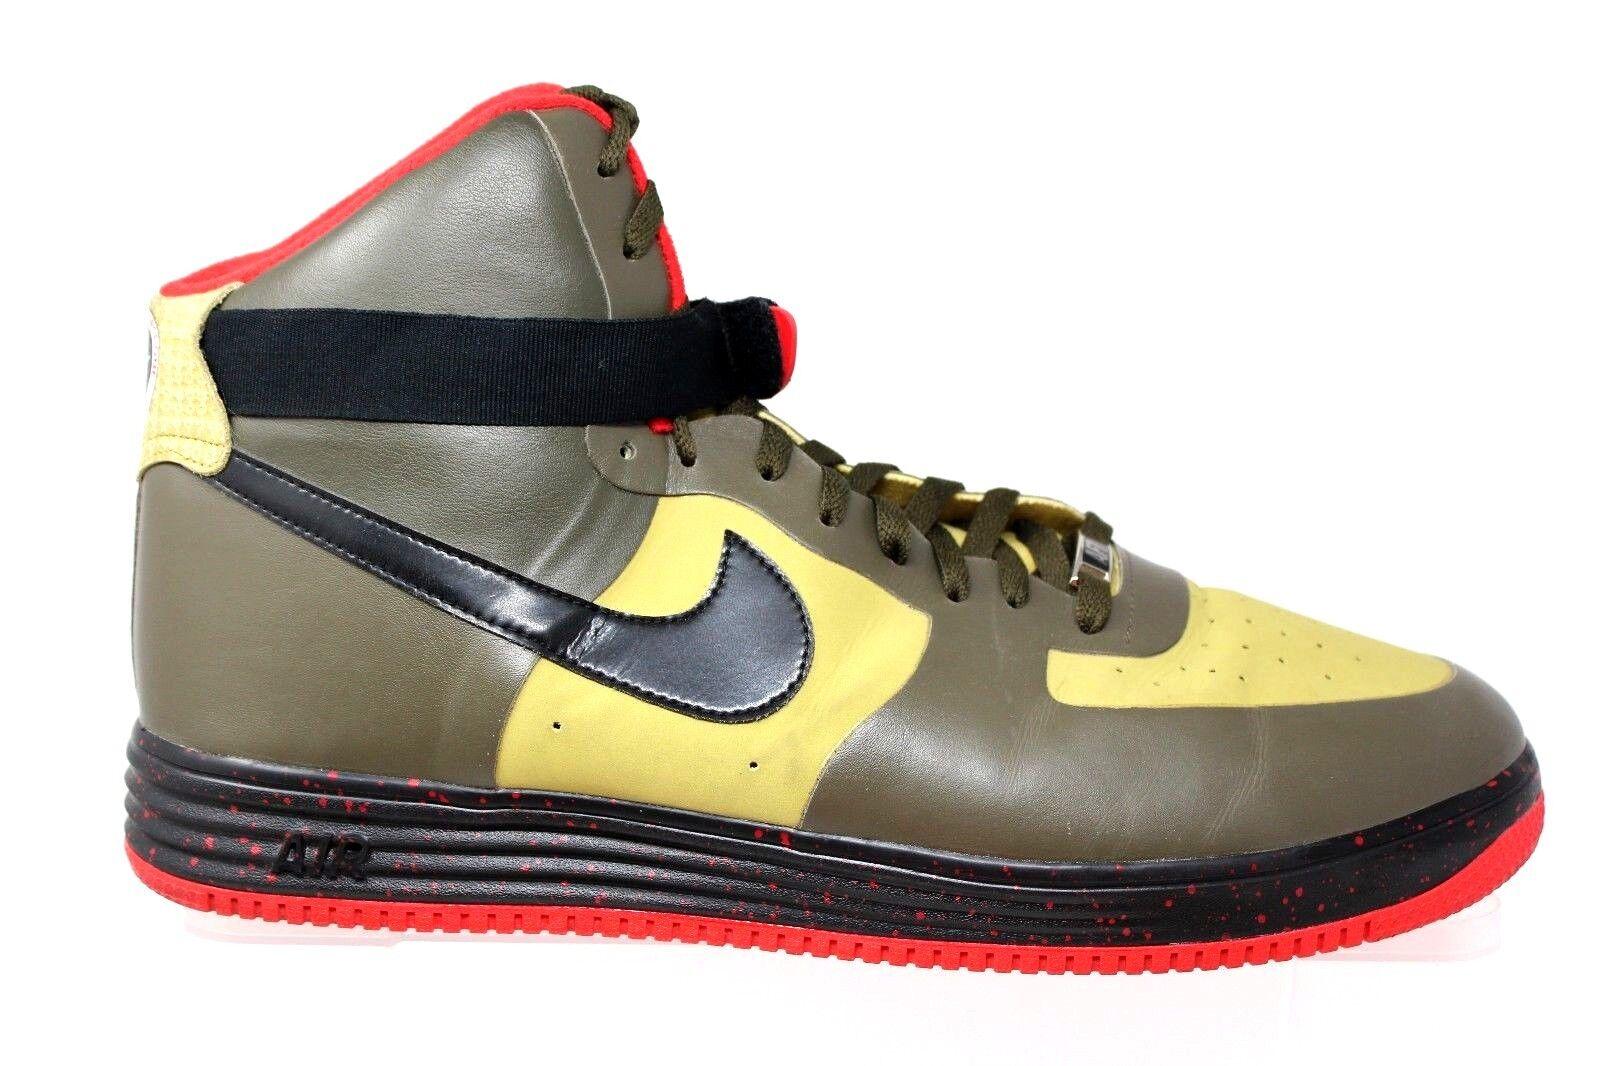 Seasonal price cuts, discount benefits Nike Lunar Force 1 NS HI PRM  Air Shoes Sneakers AF1 616767-700 Mens Comfortable